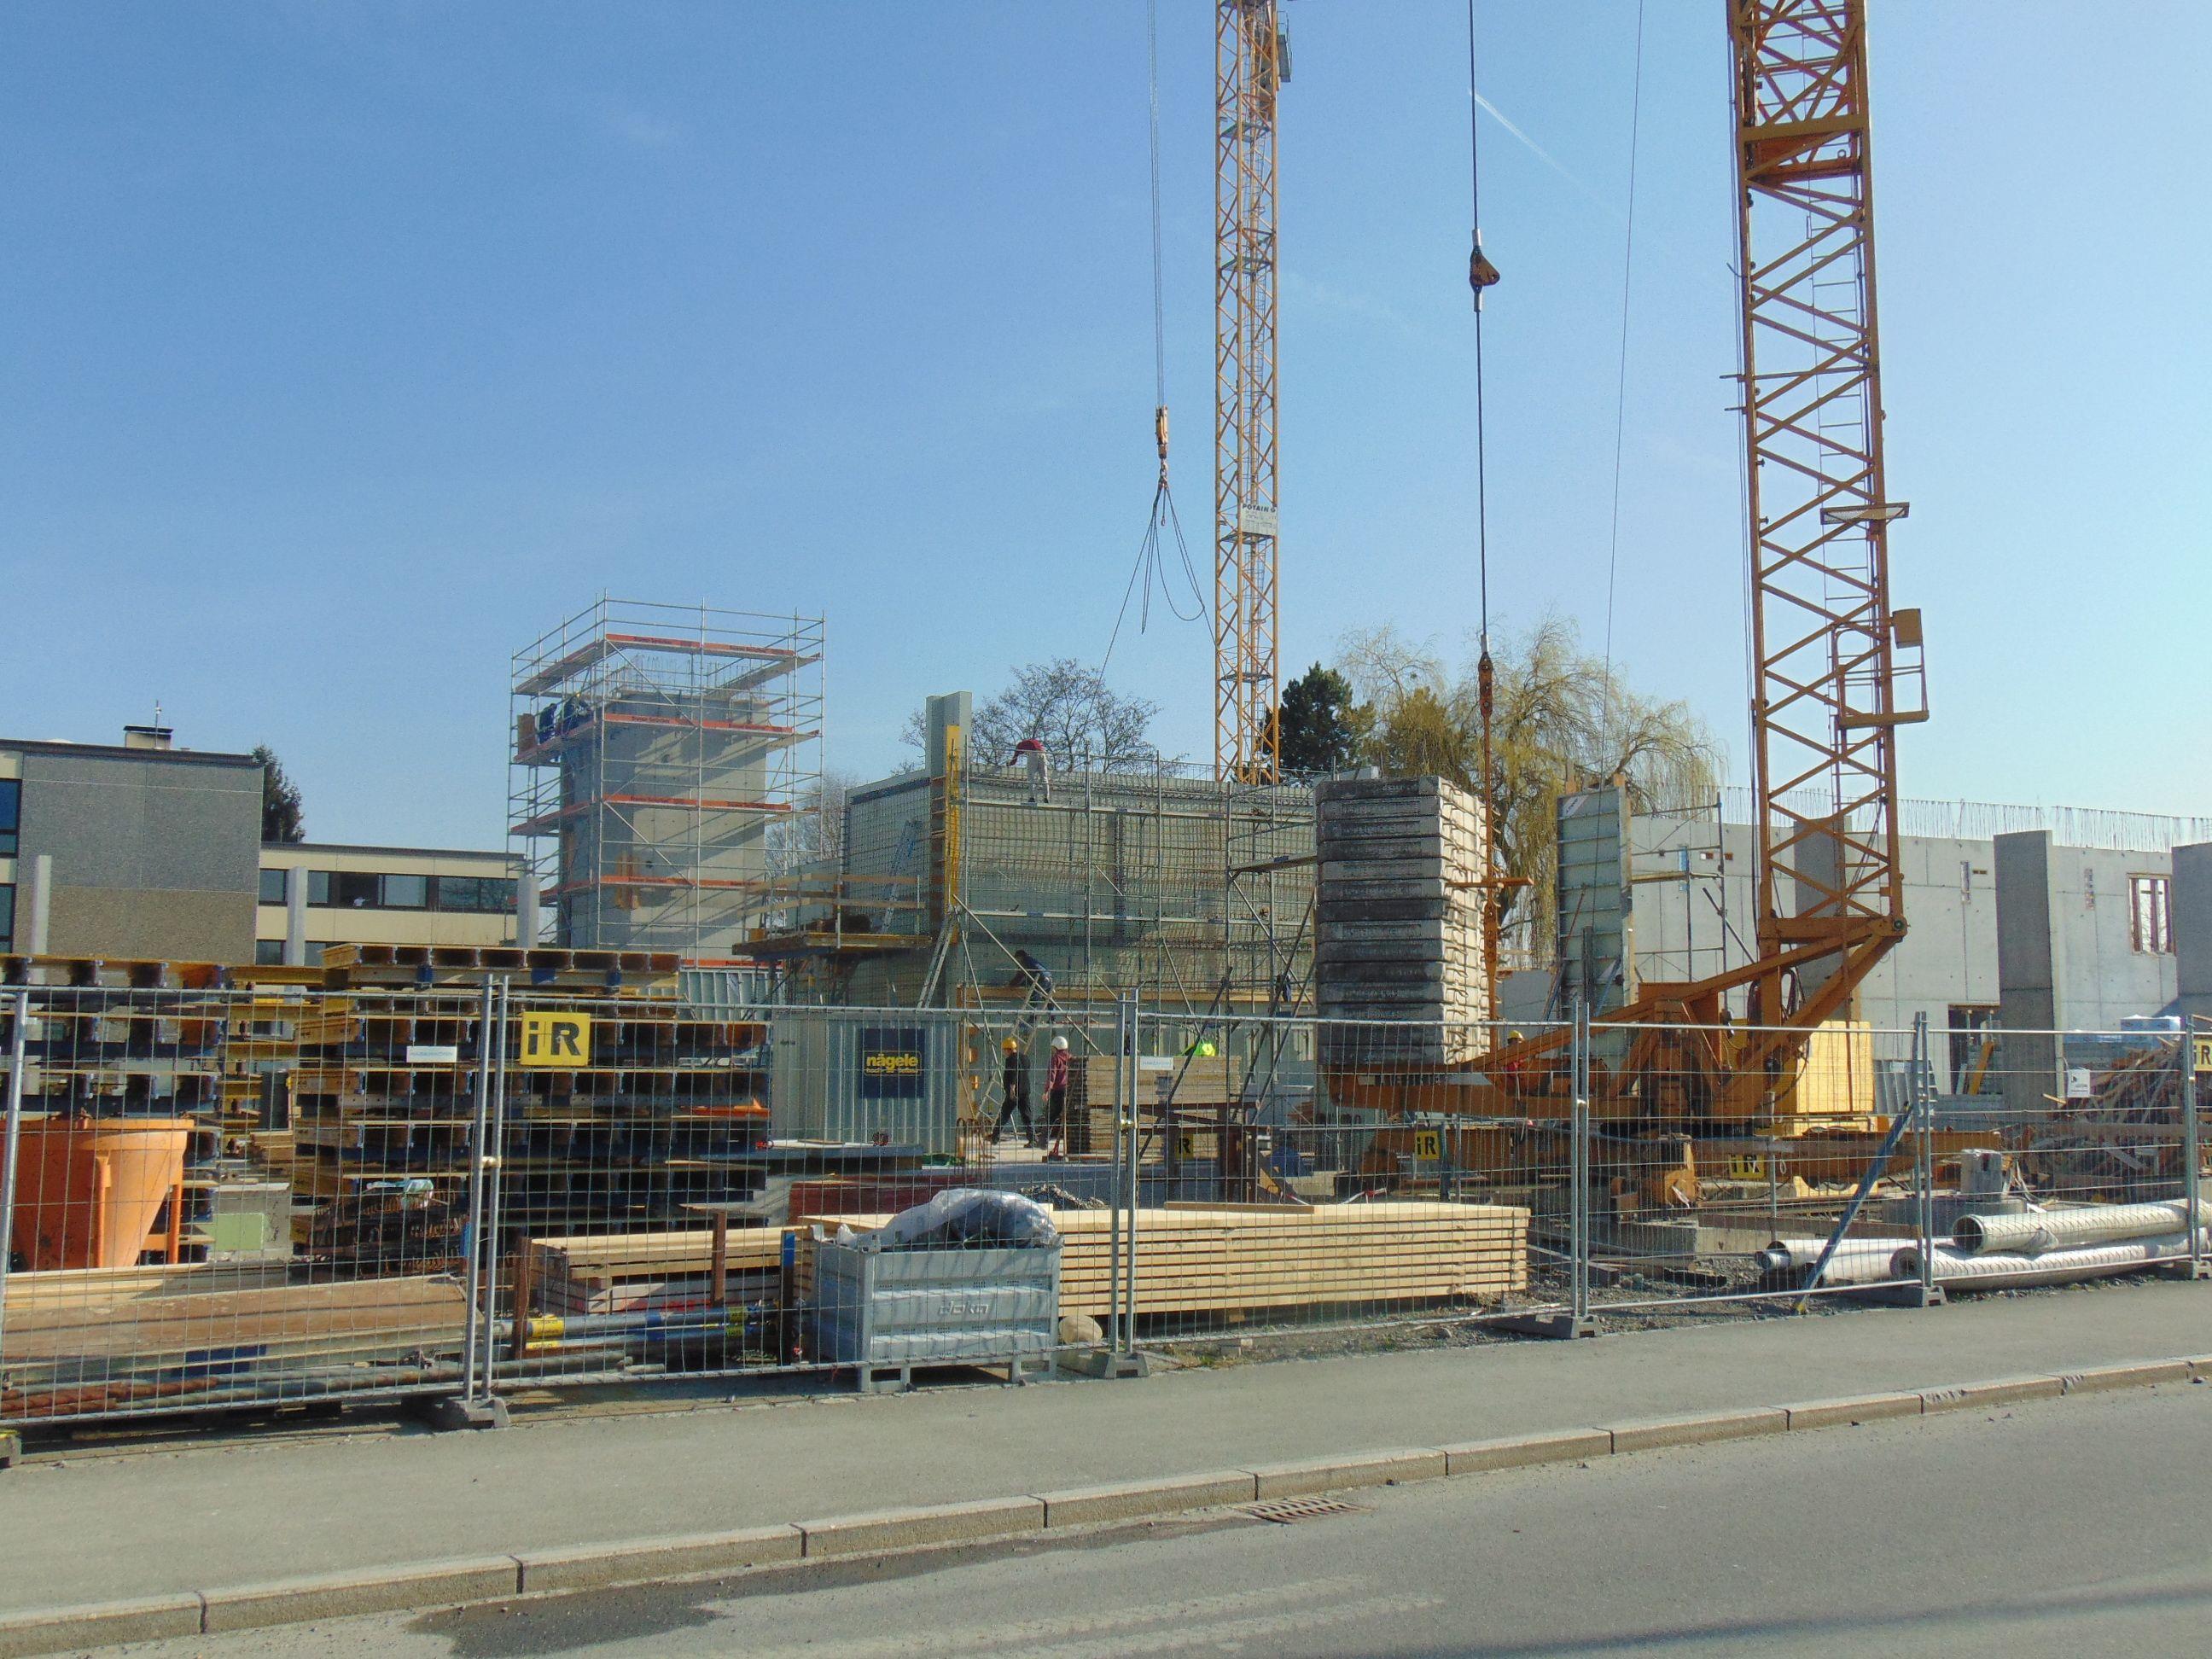 Das neue Feuerwehrhaus in Lustenau wächst in die Höhe